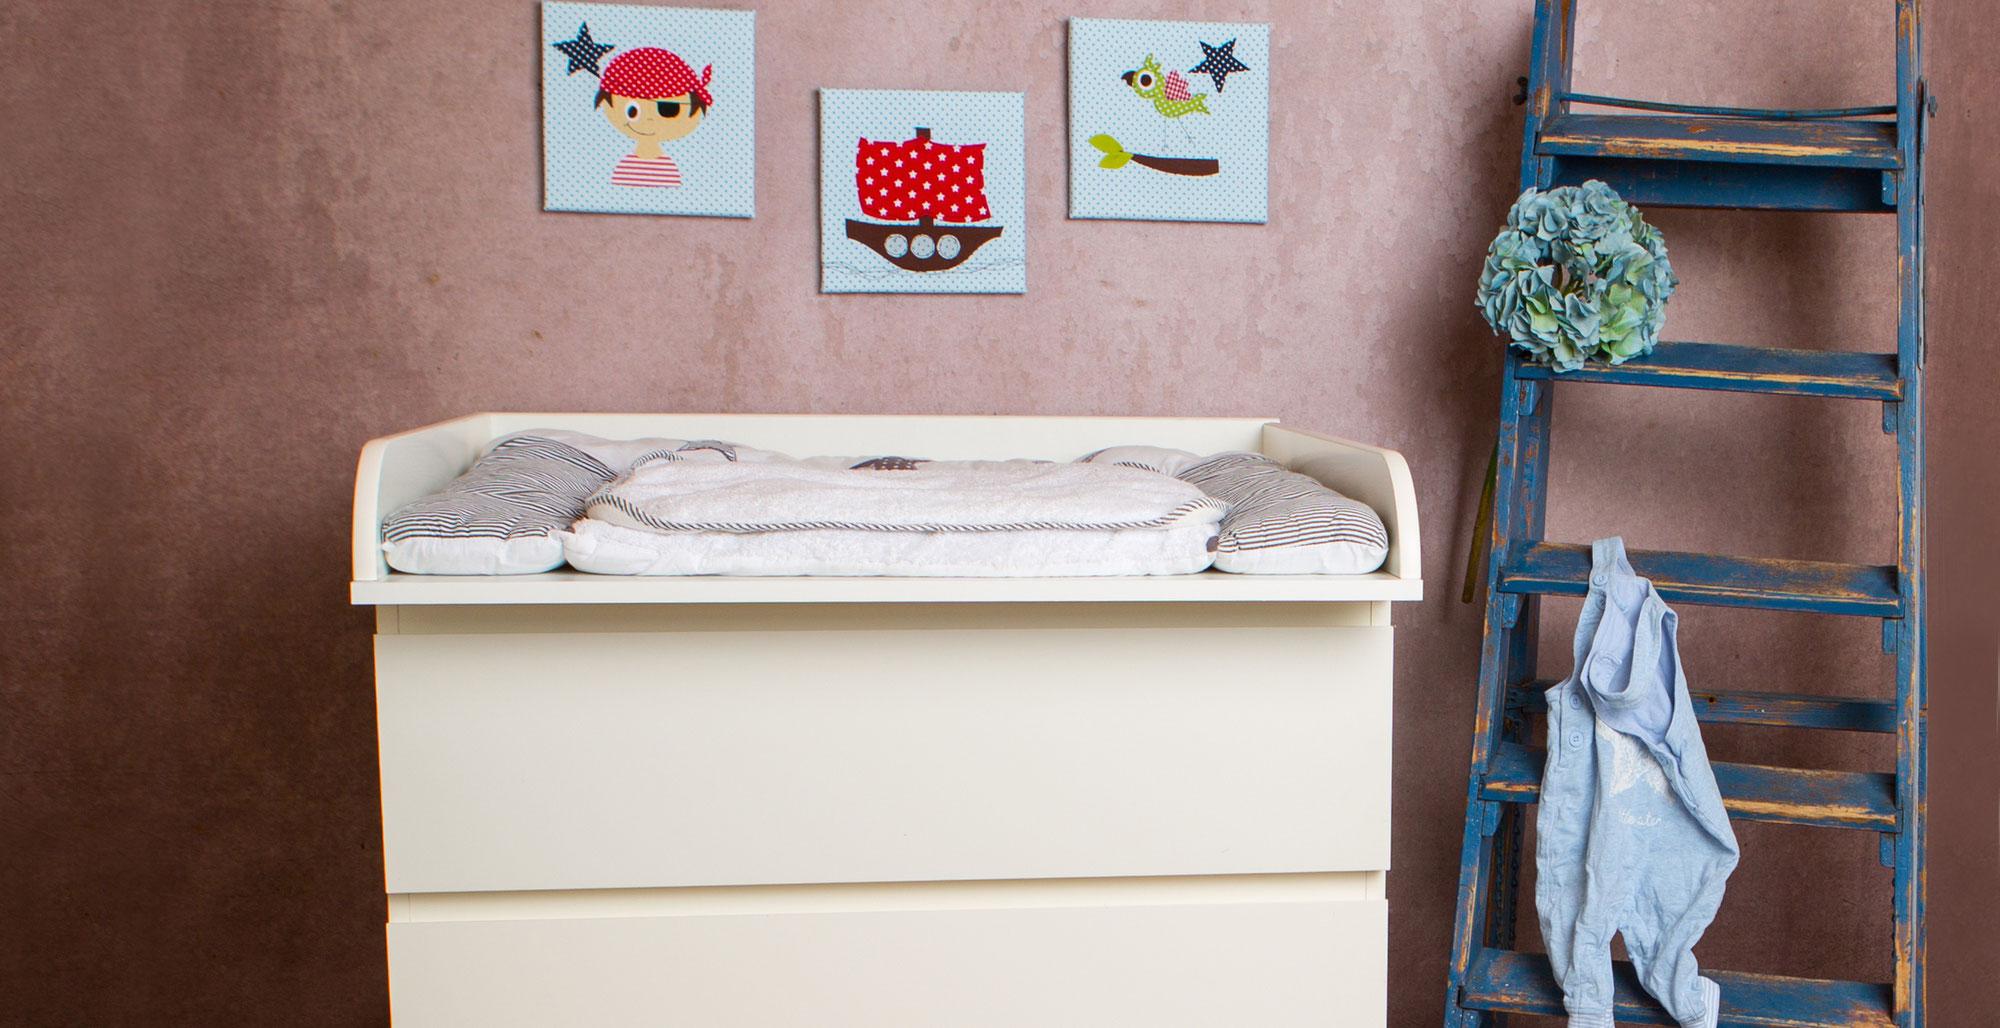 malm puckdaddy wickelaufs tze f r deine ikea kommode. Black Bedroom Furniture Sets. Home Design Ideas